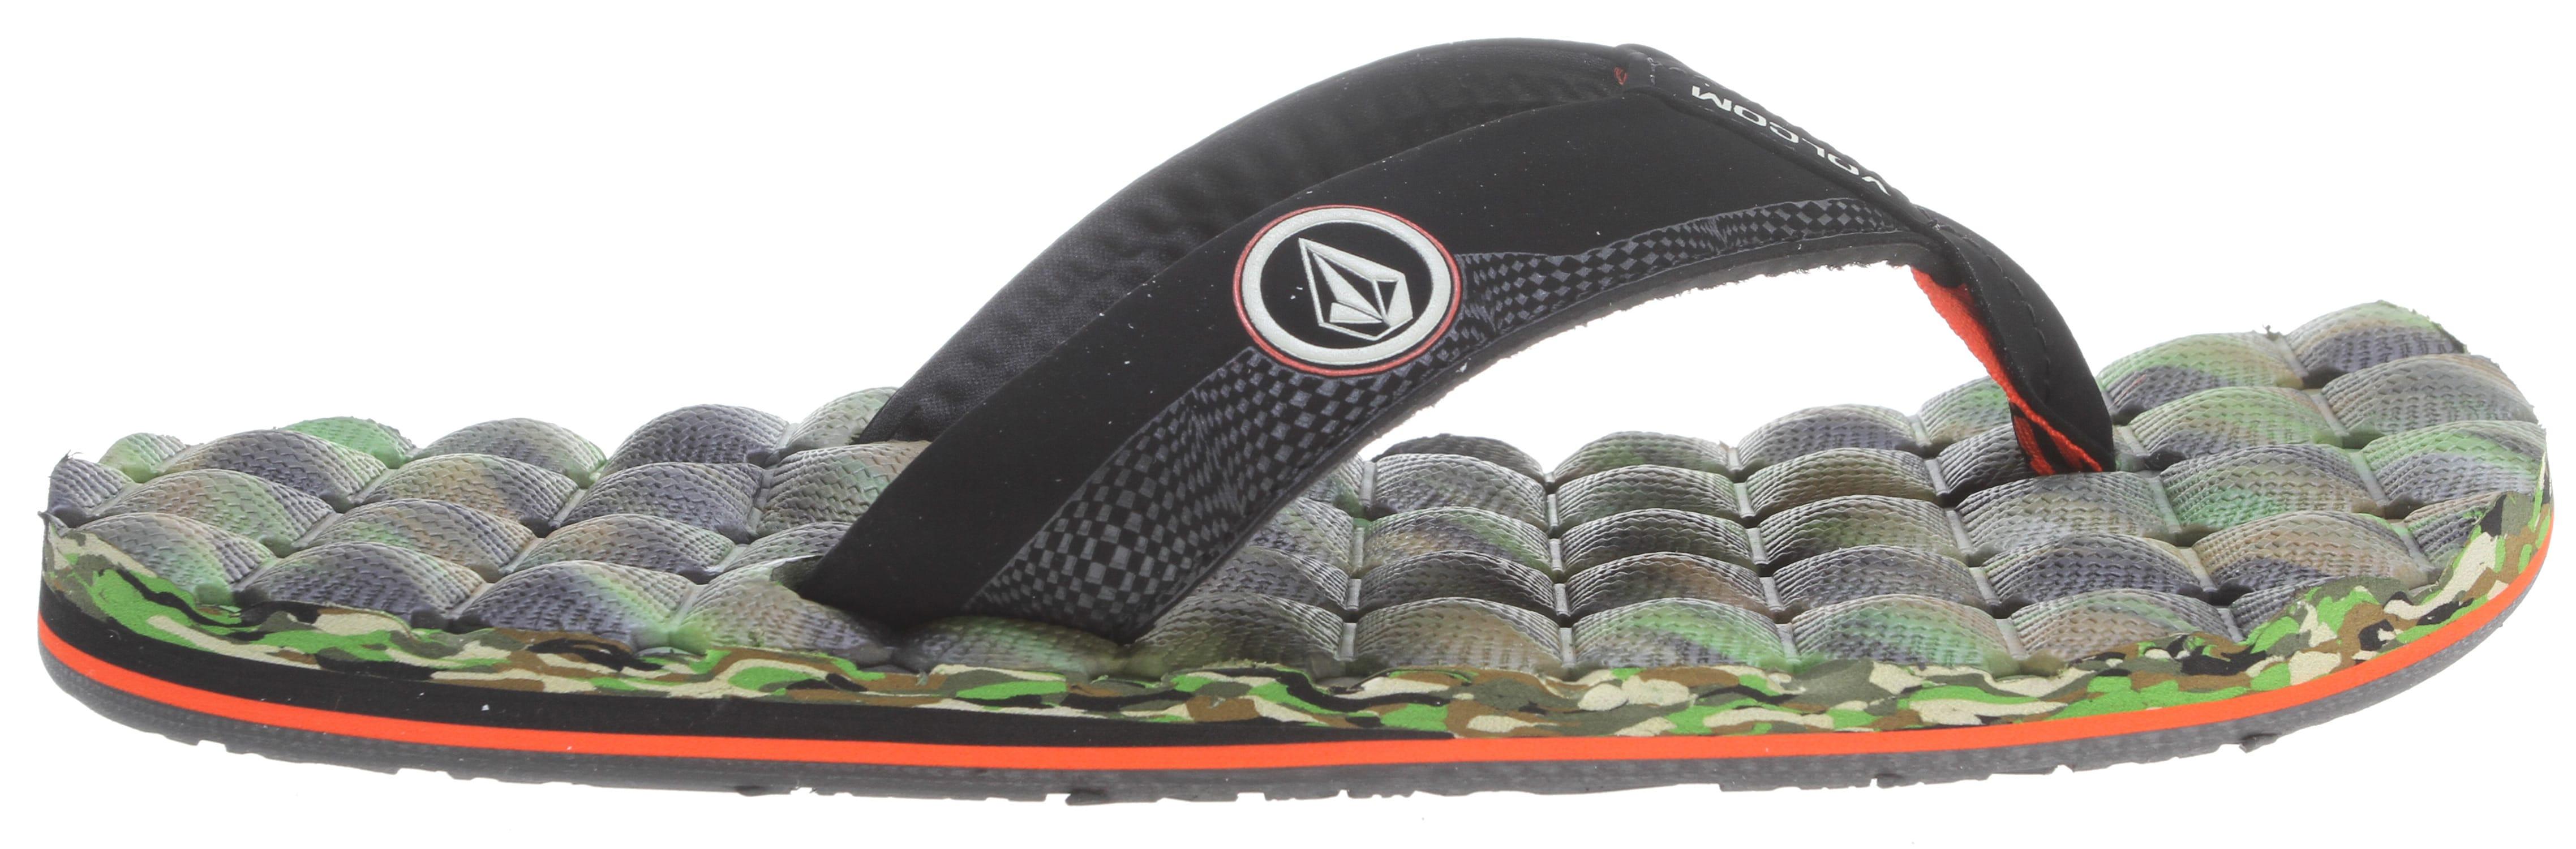 f394c434b068 Volcom Recliner Sandals - thumbnail 1